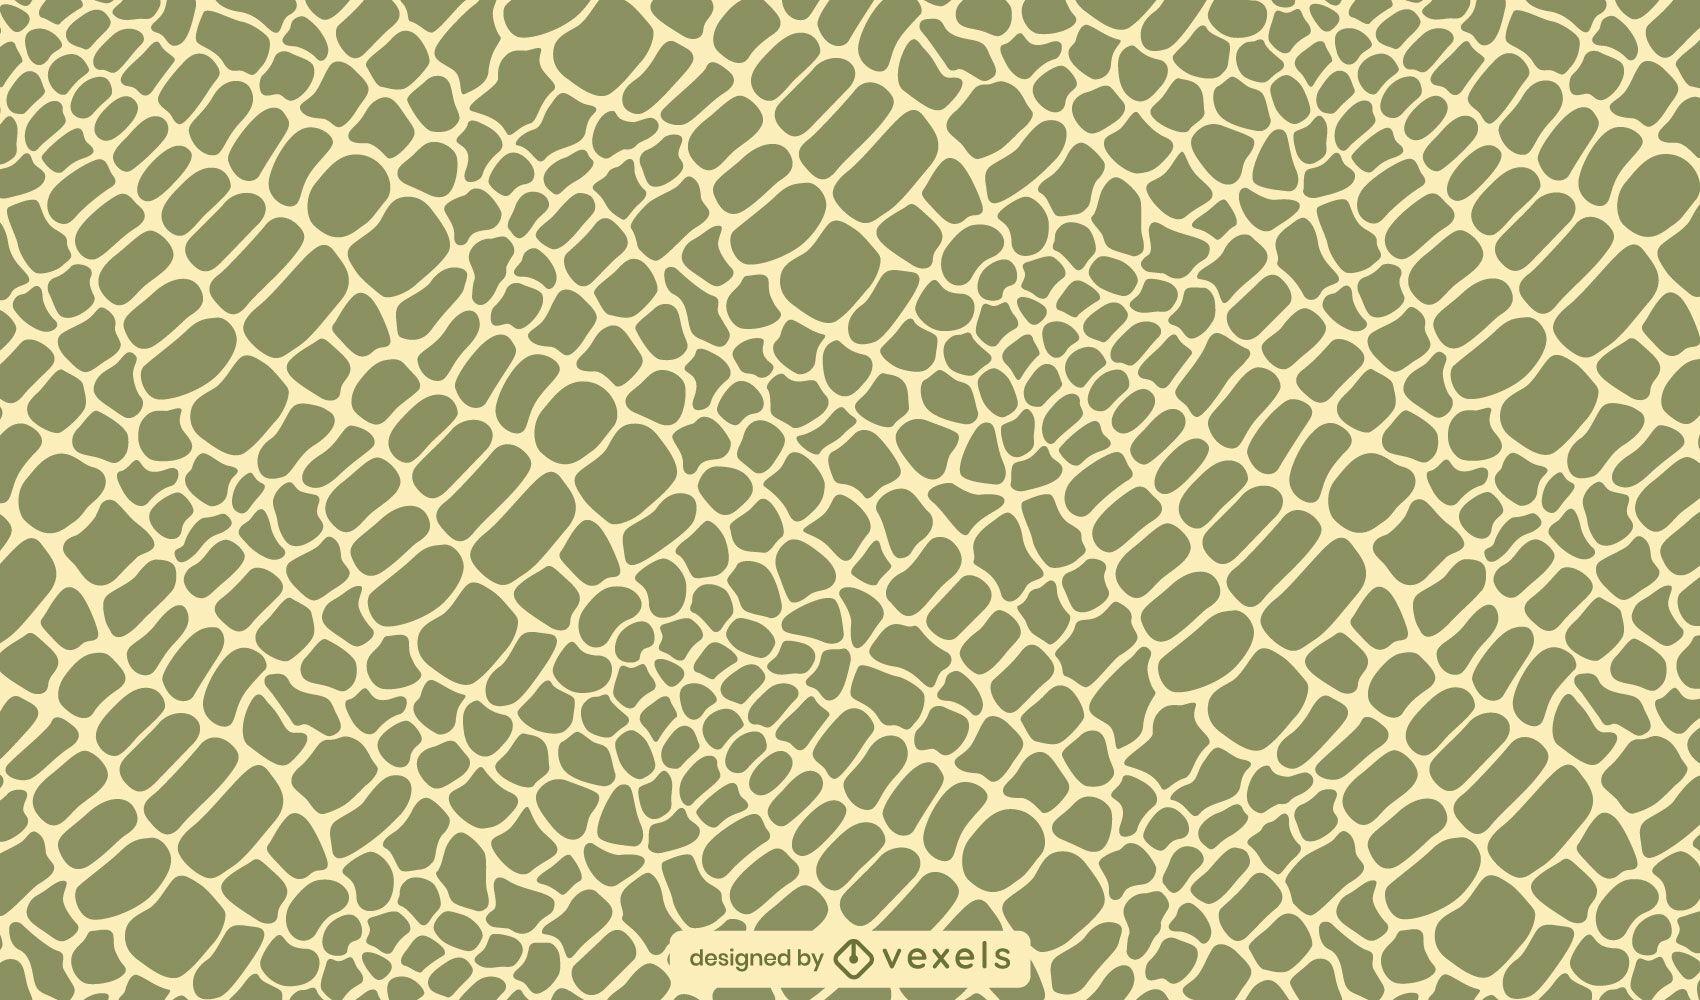 Crocodile skin pattern design